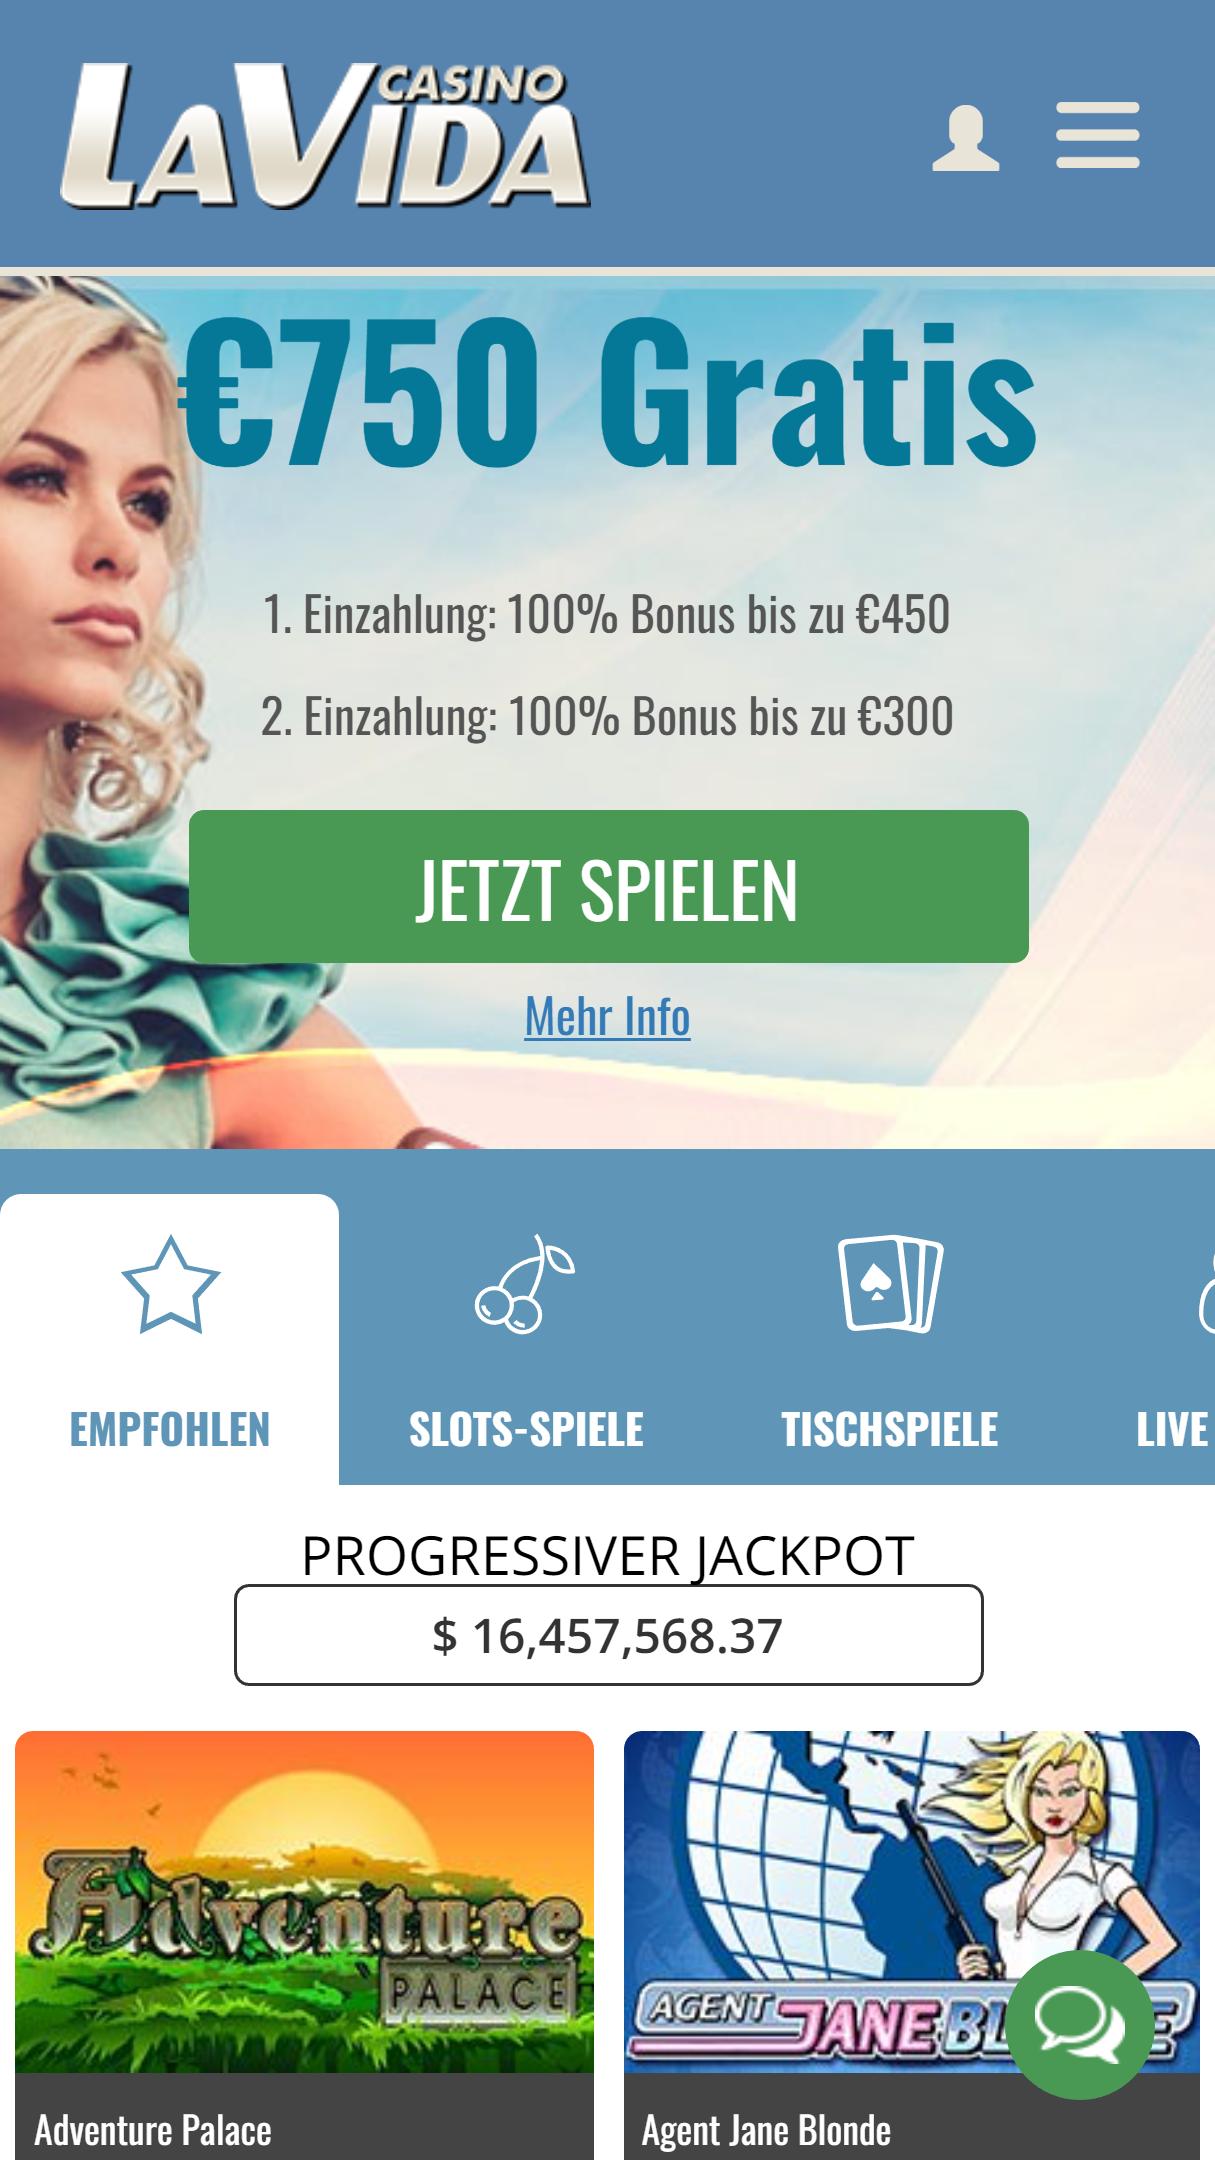 Casino LaVida App Homepage